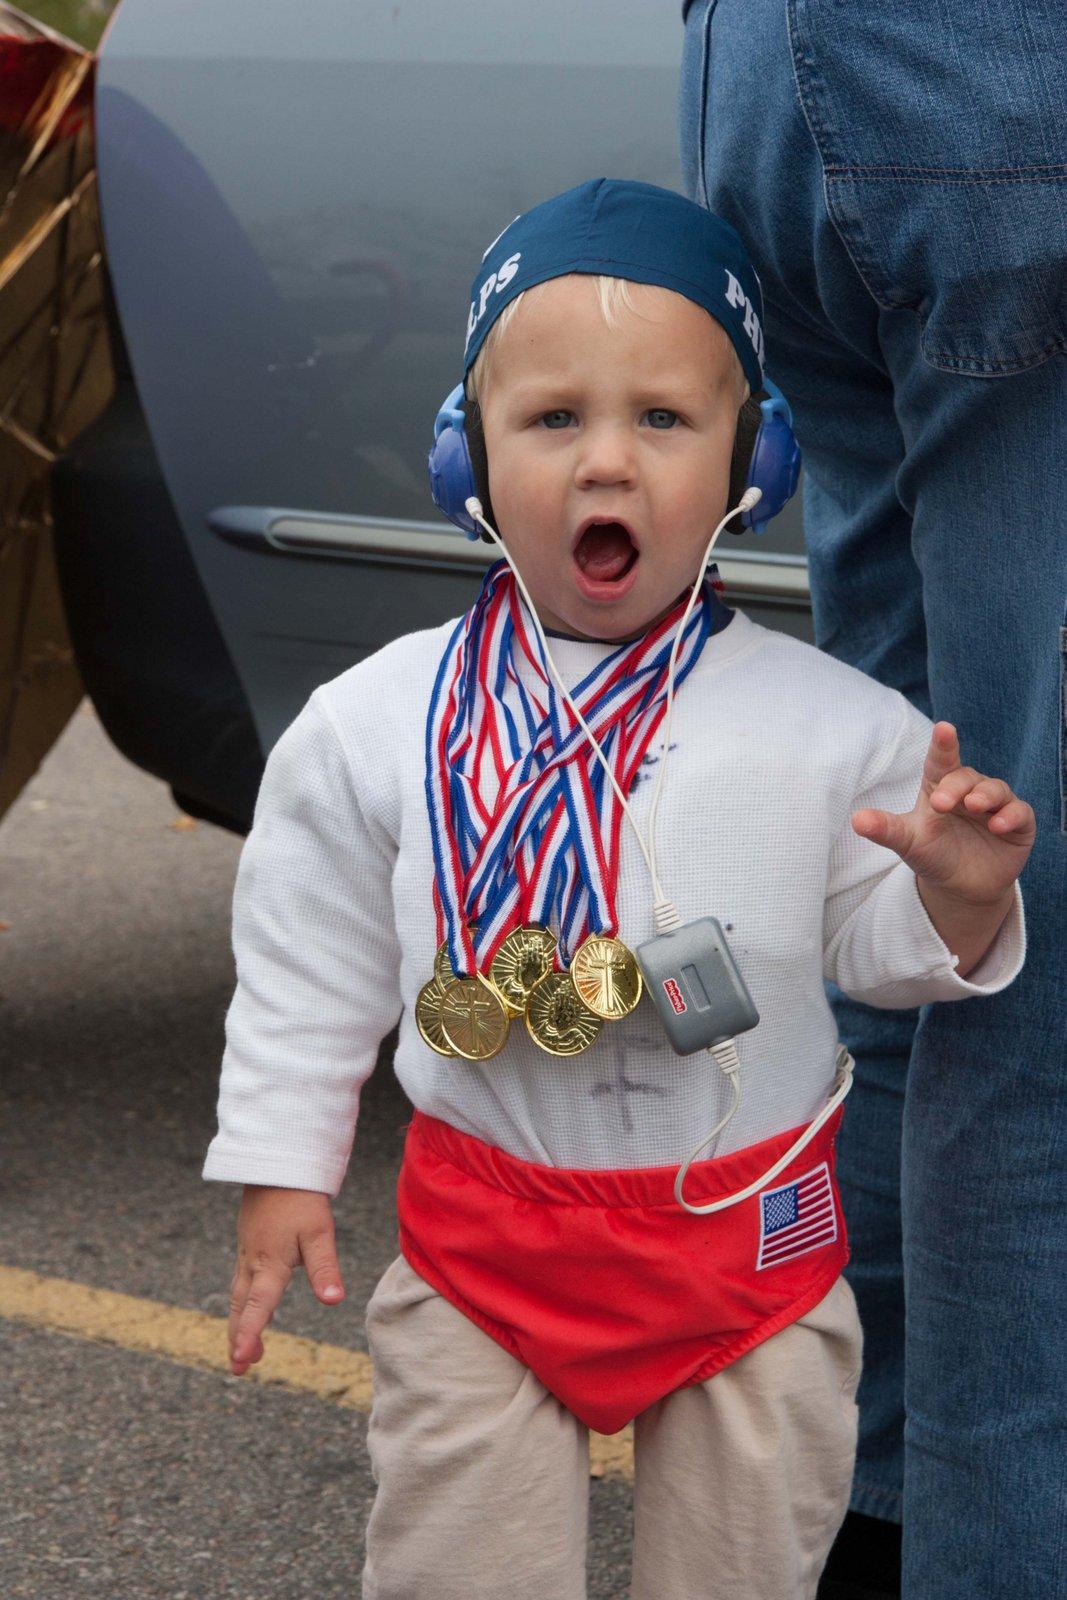 This Year's Halloween Costume Theme - Olympics! | Hess Family Blog!